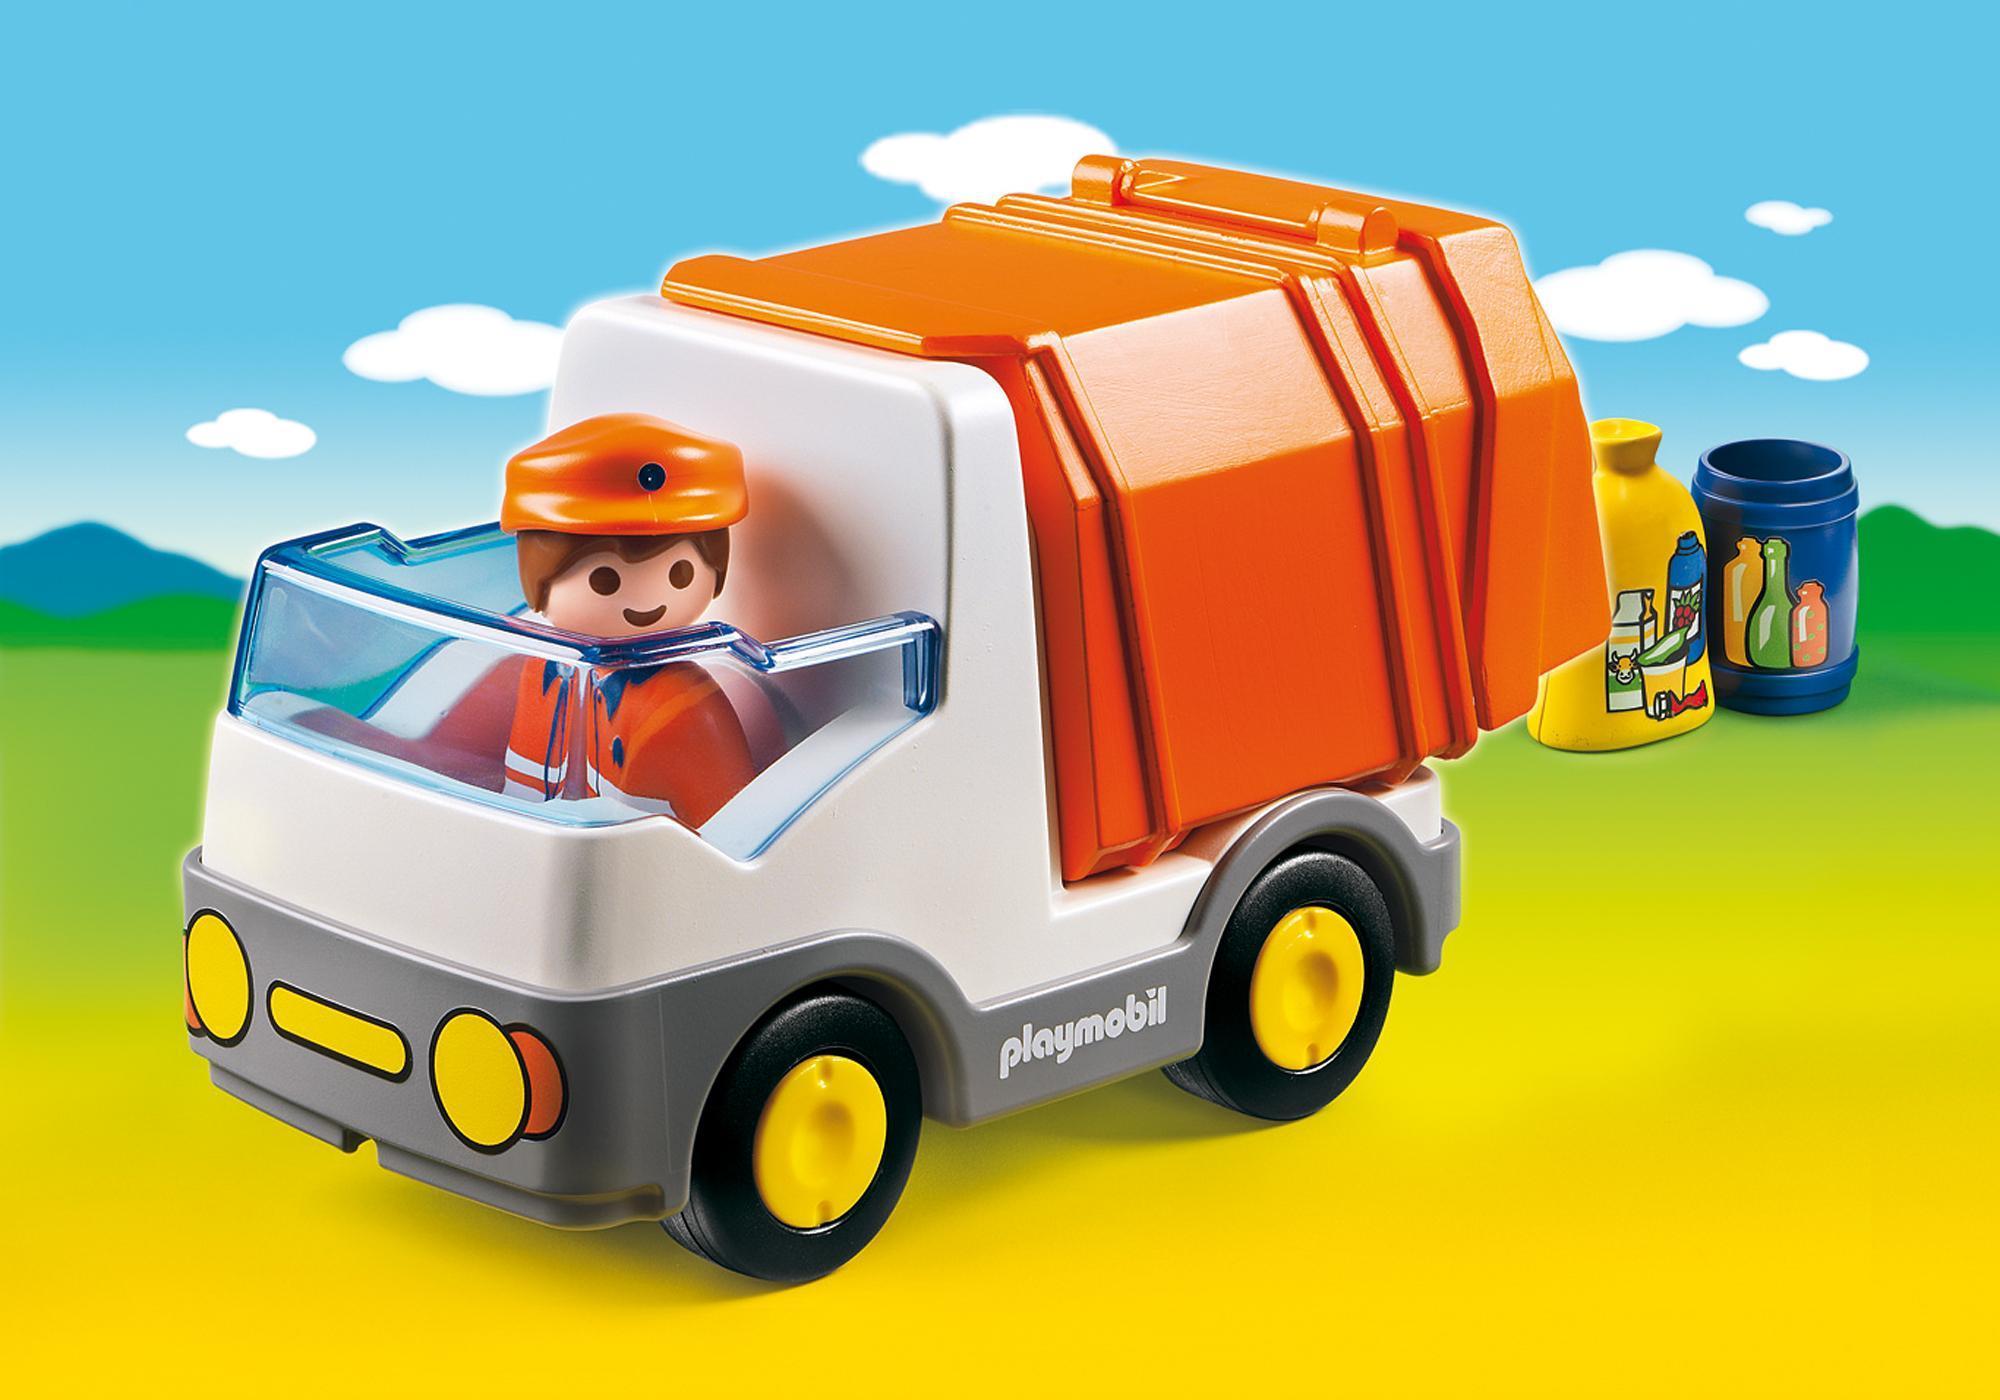 http://media.playmobil.com/i/playmobil/6774_product_detail/1.2.3 Camión de Basura